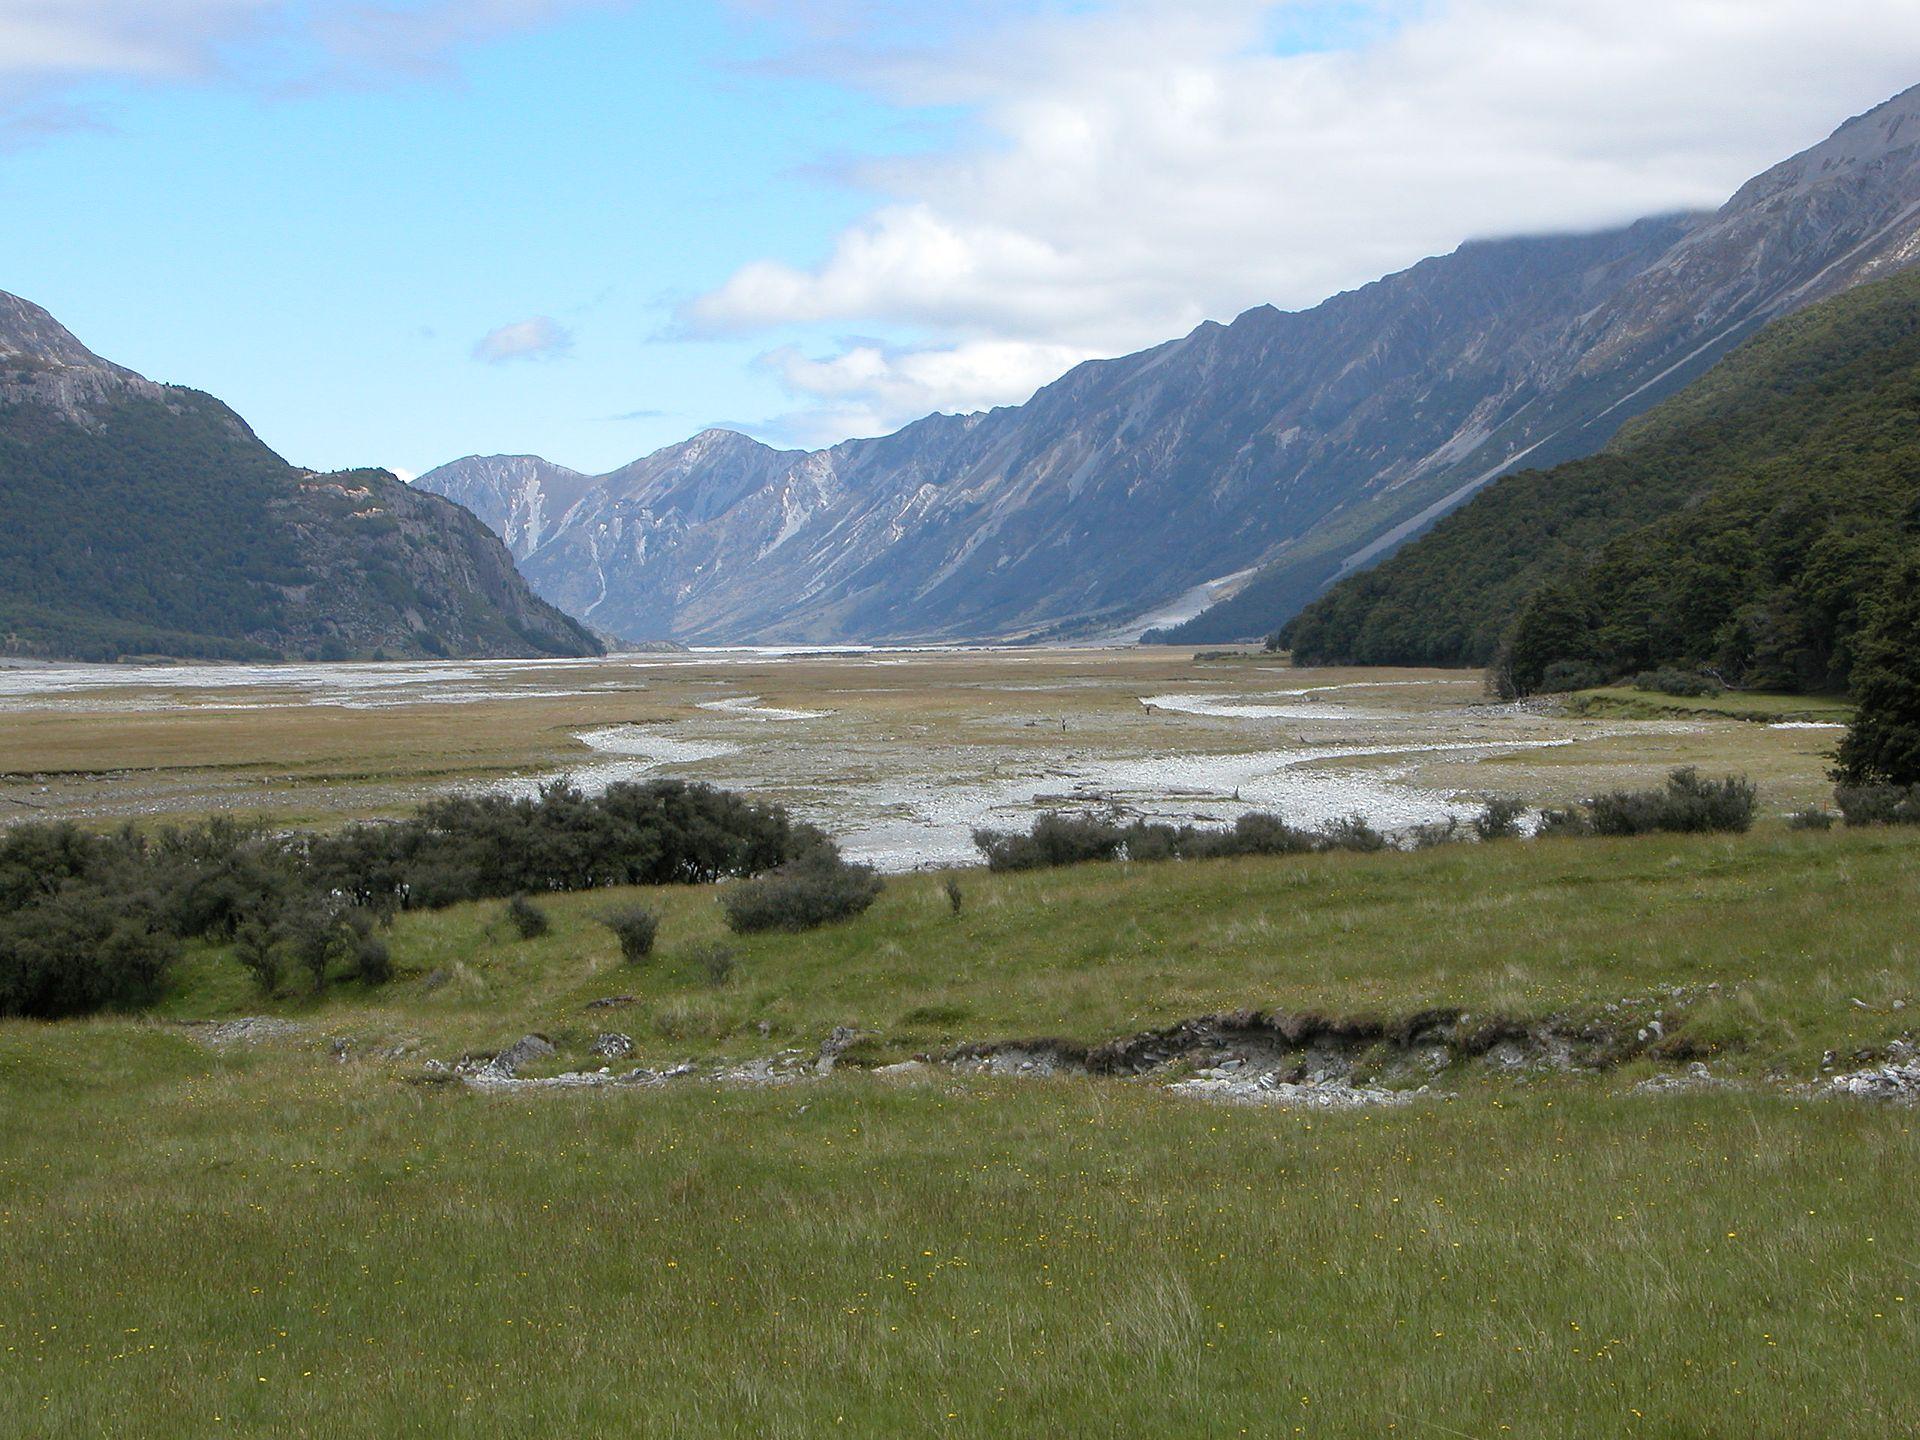 New Zealand Wikipedia: Hopkins River (New Zealand)